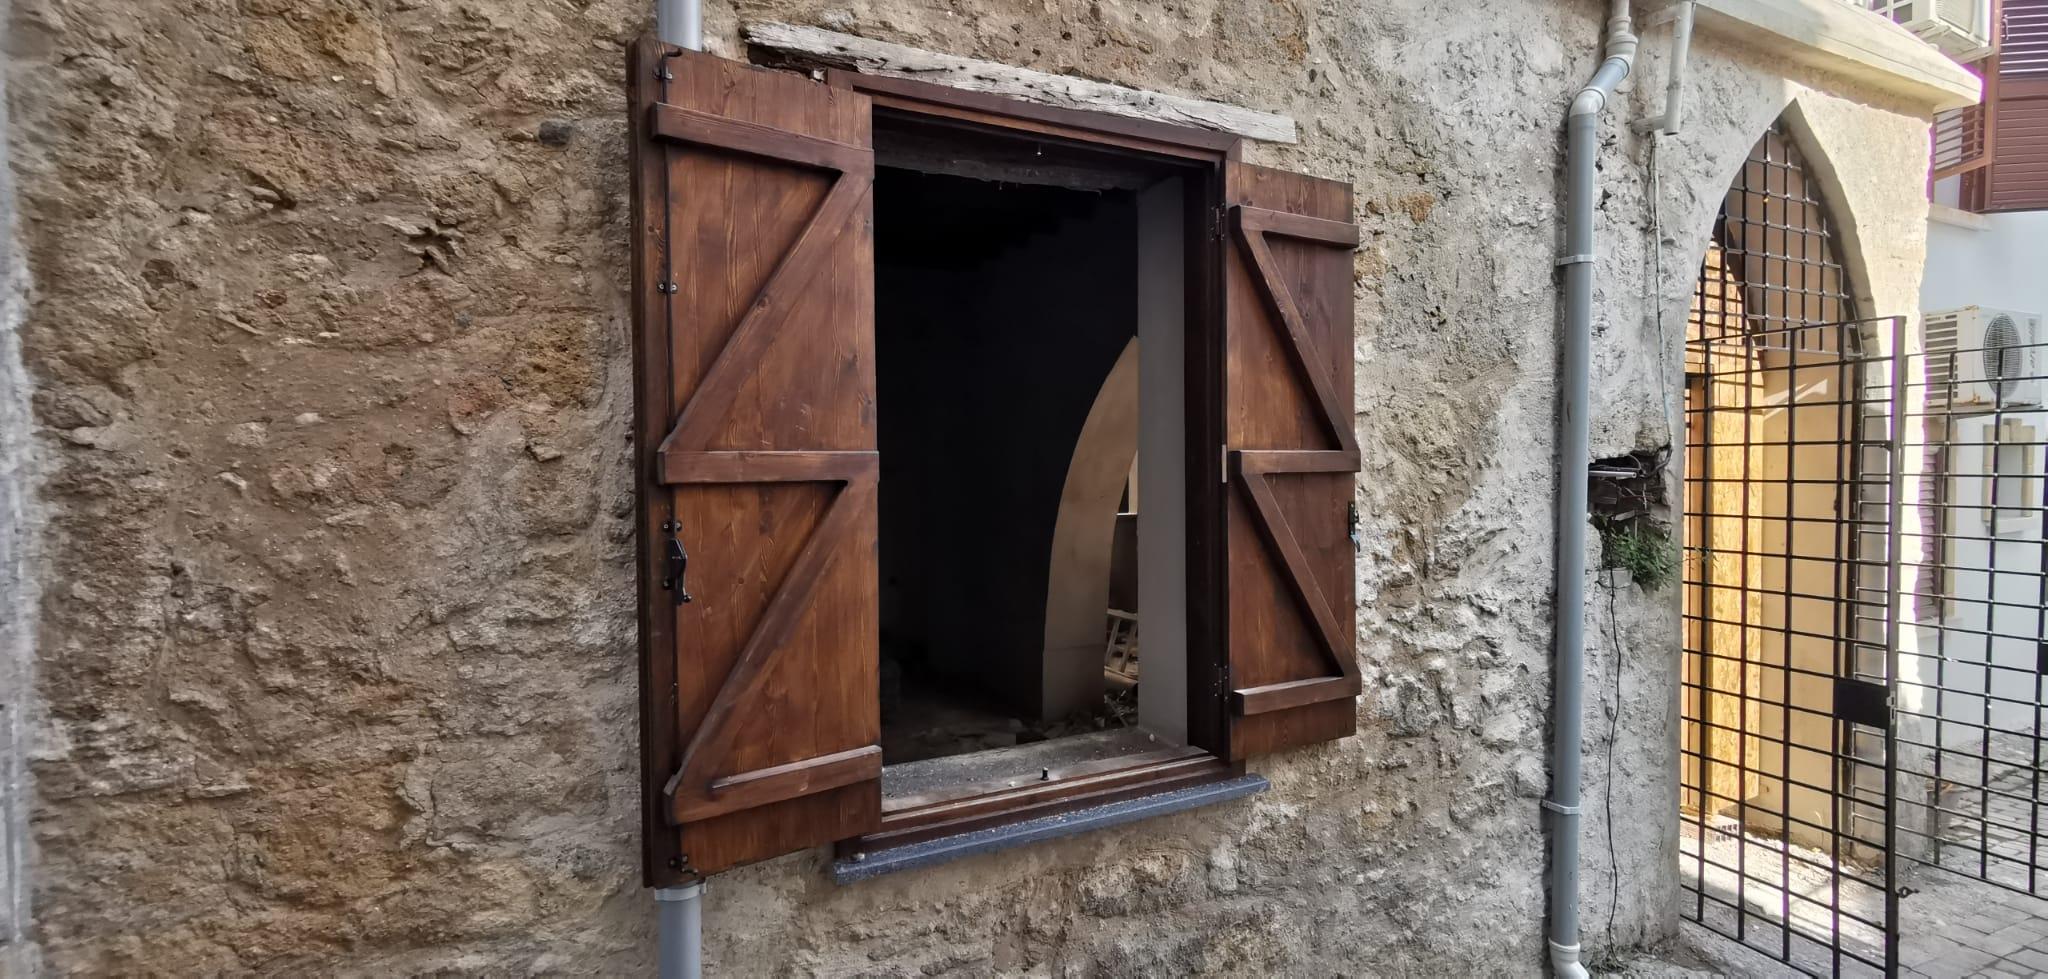 RESTORATION HOUSE/PROJECT IN CENTRE OF KYRENIA